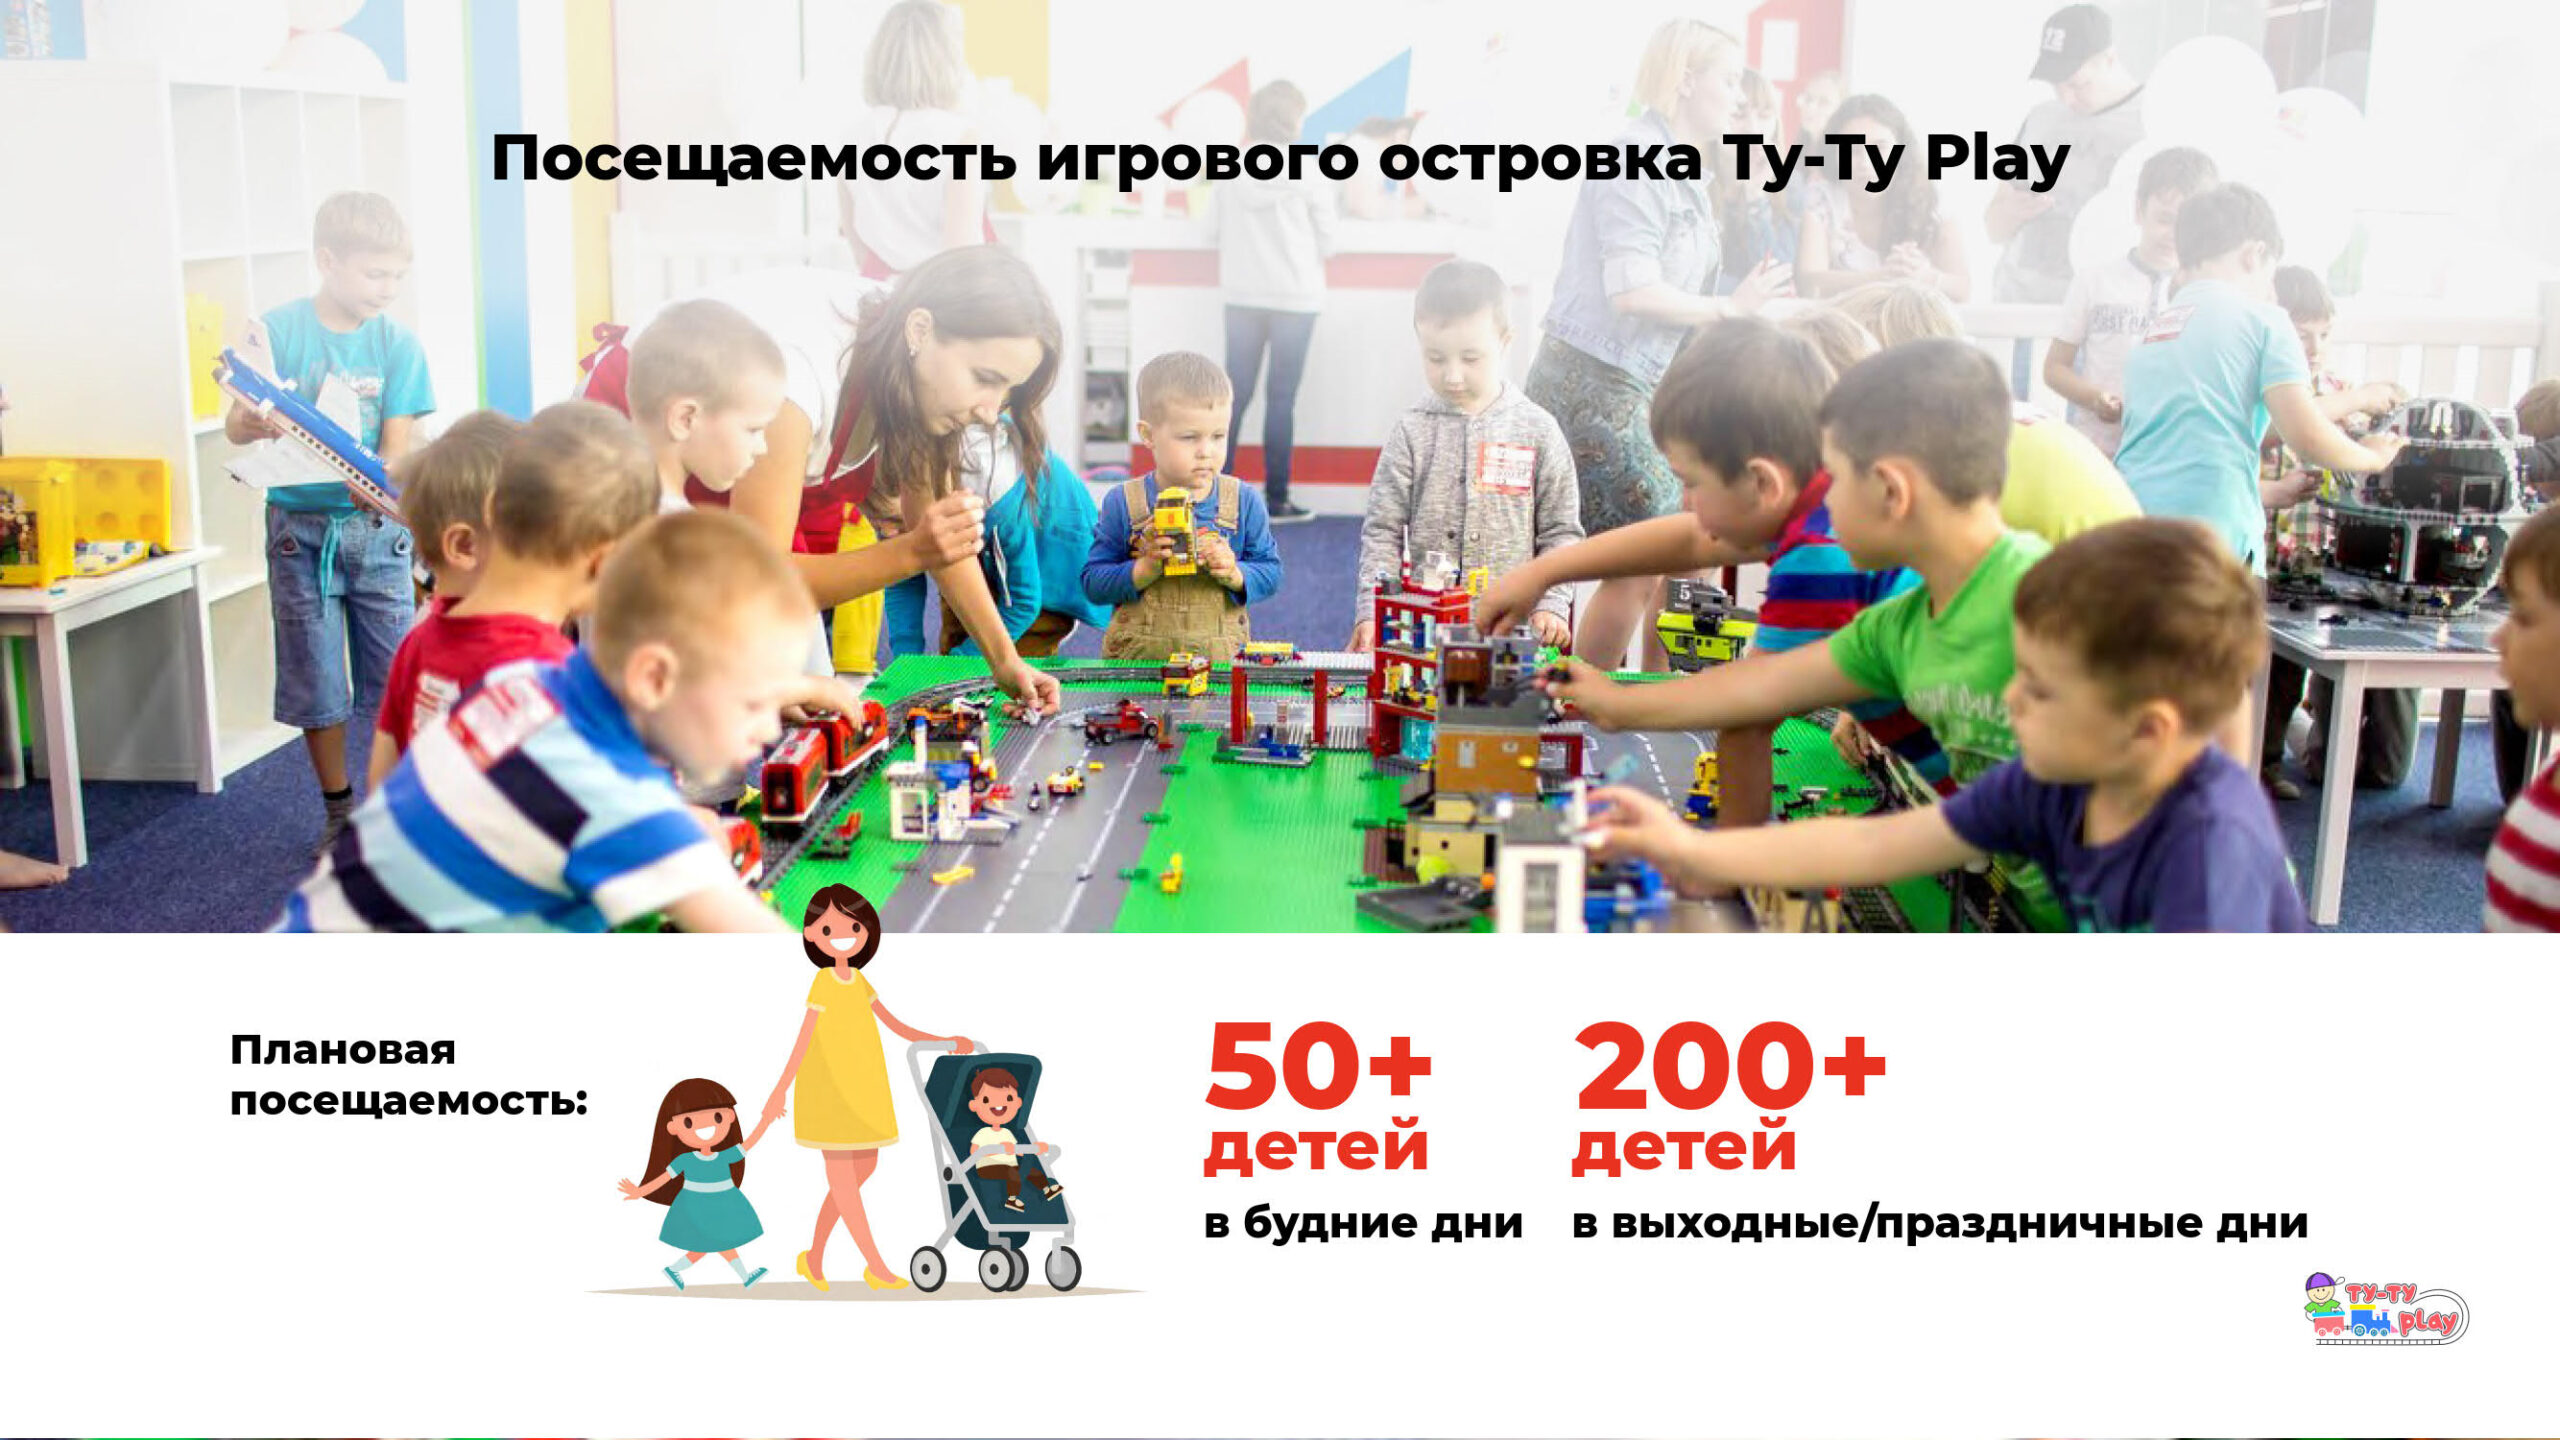 Prezentacija-detskogo-igrovogo-ostrovka-dlja-TRC-poseshhaemost